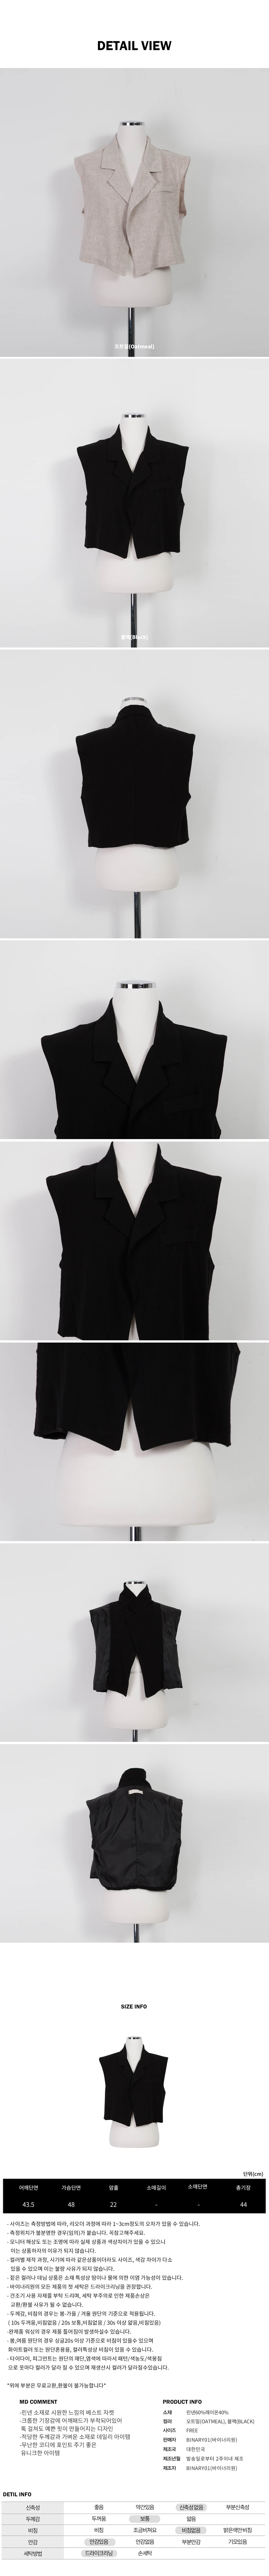 Linen binble rider vest